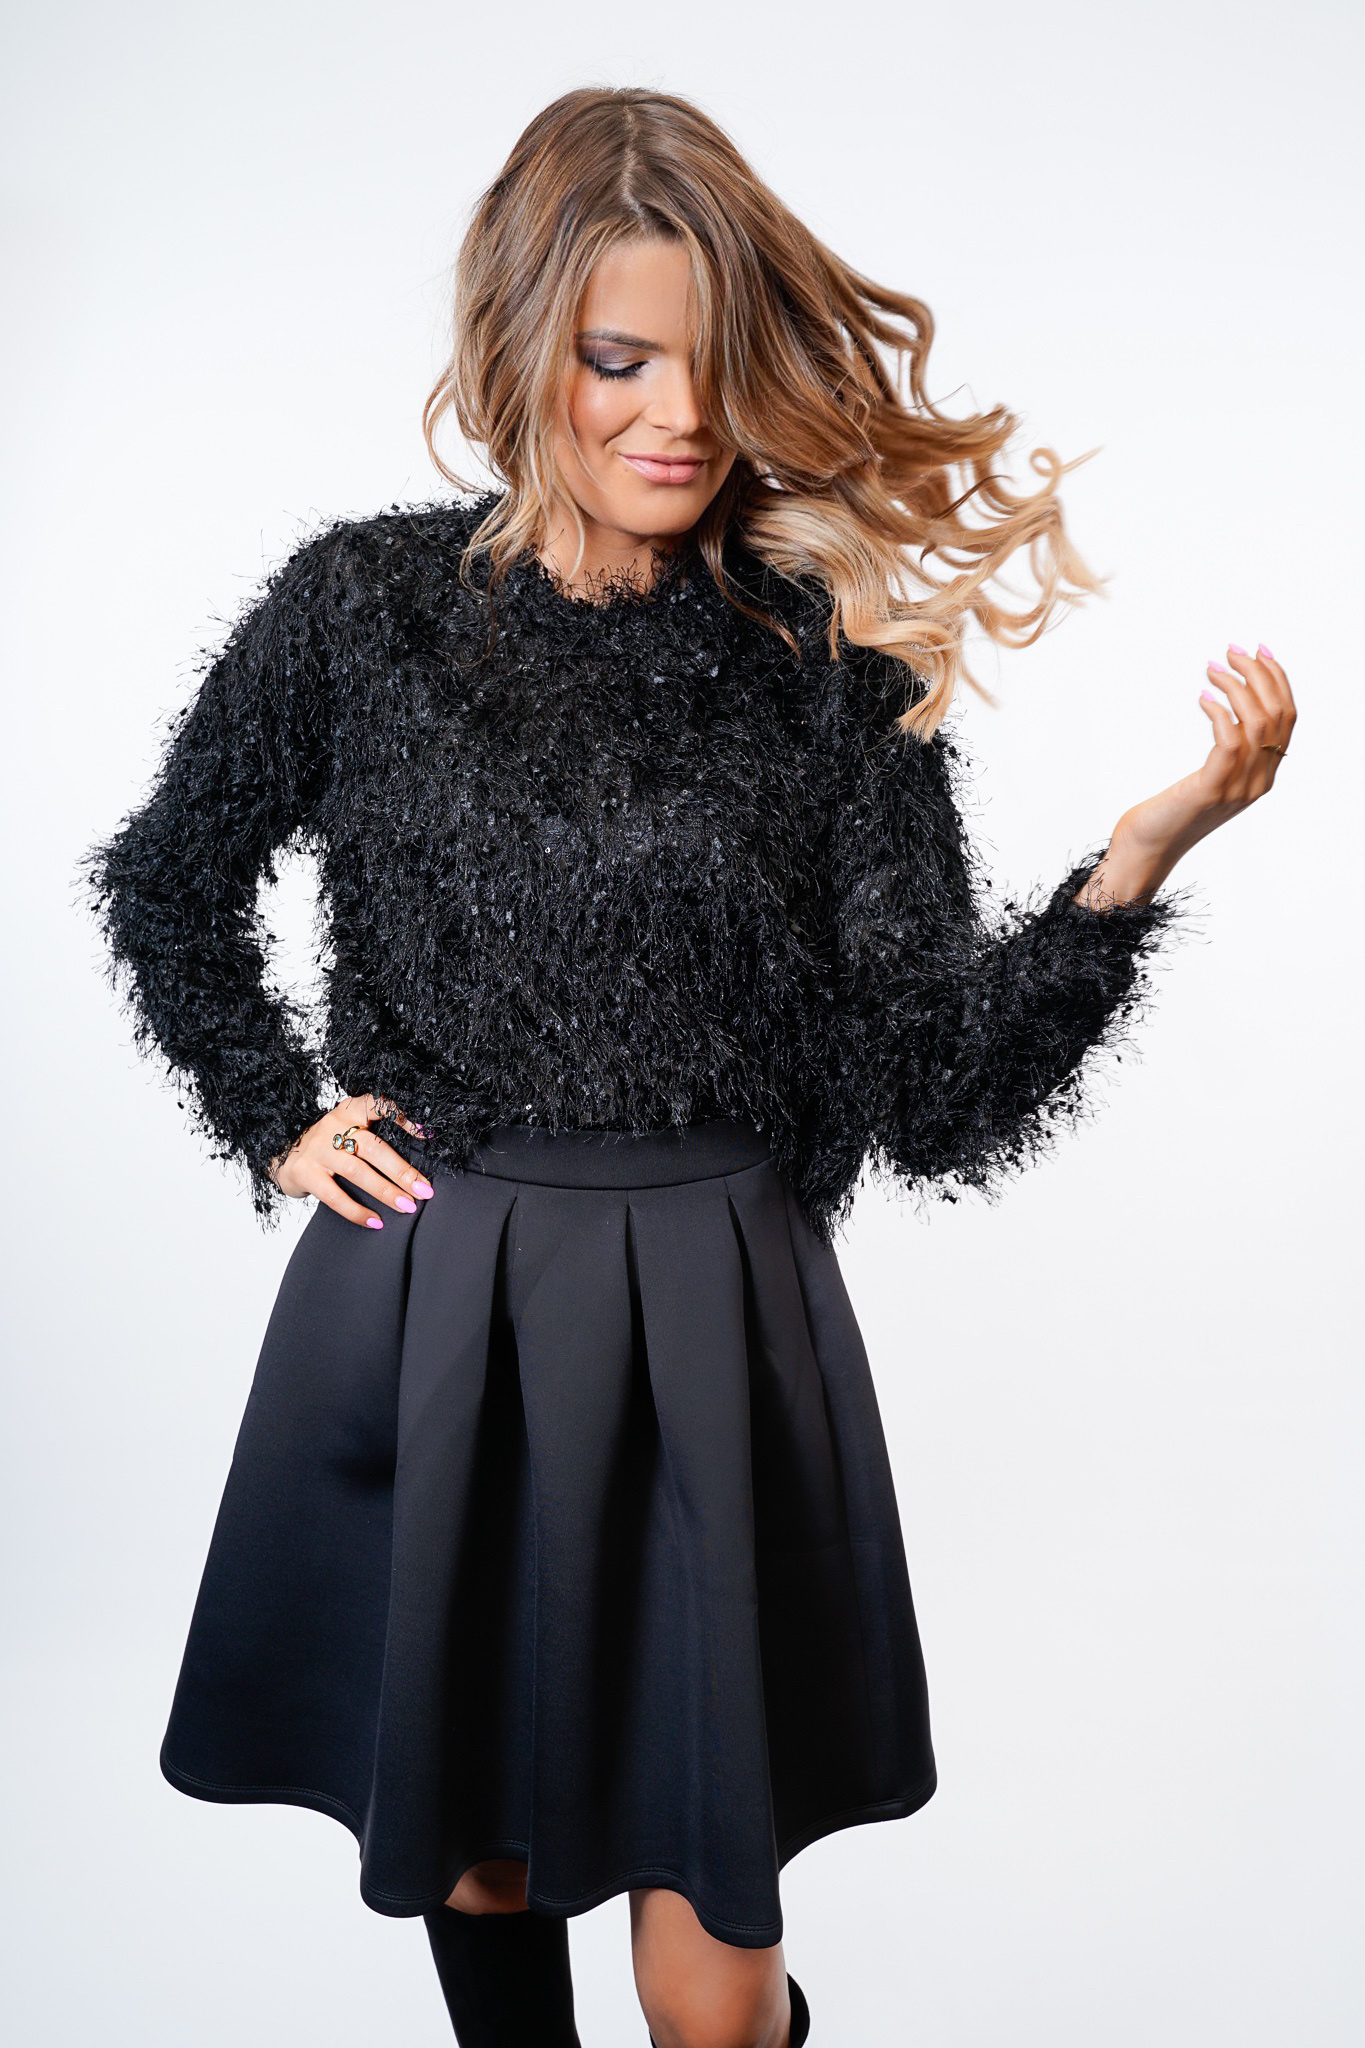 YENTLK Fril Knit Black